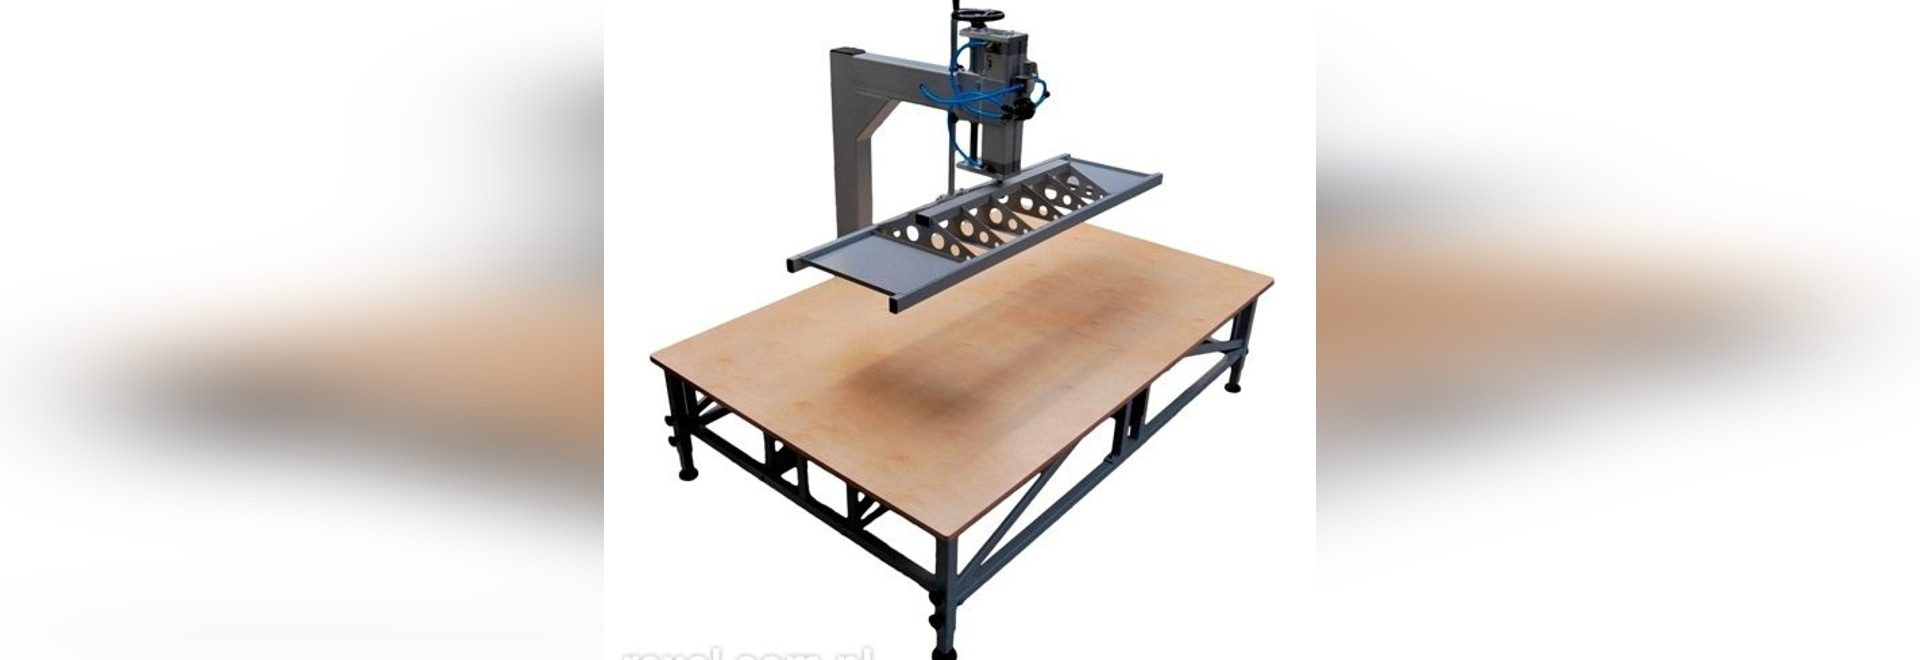 NEW: pneumatic press by REXEL